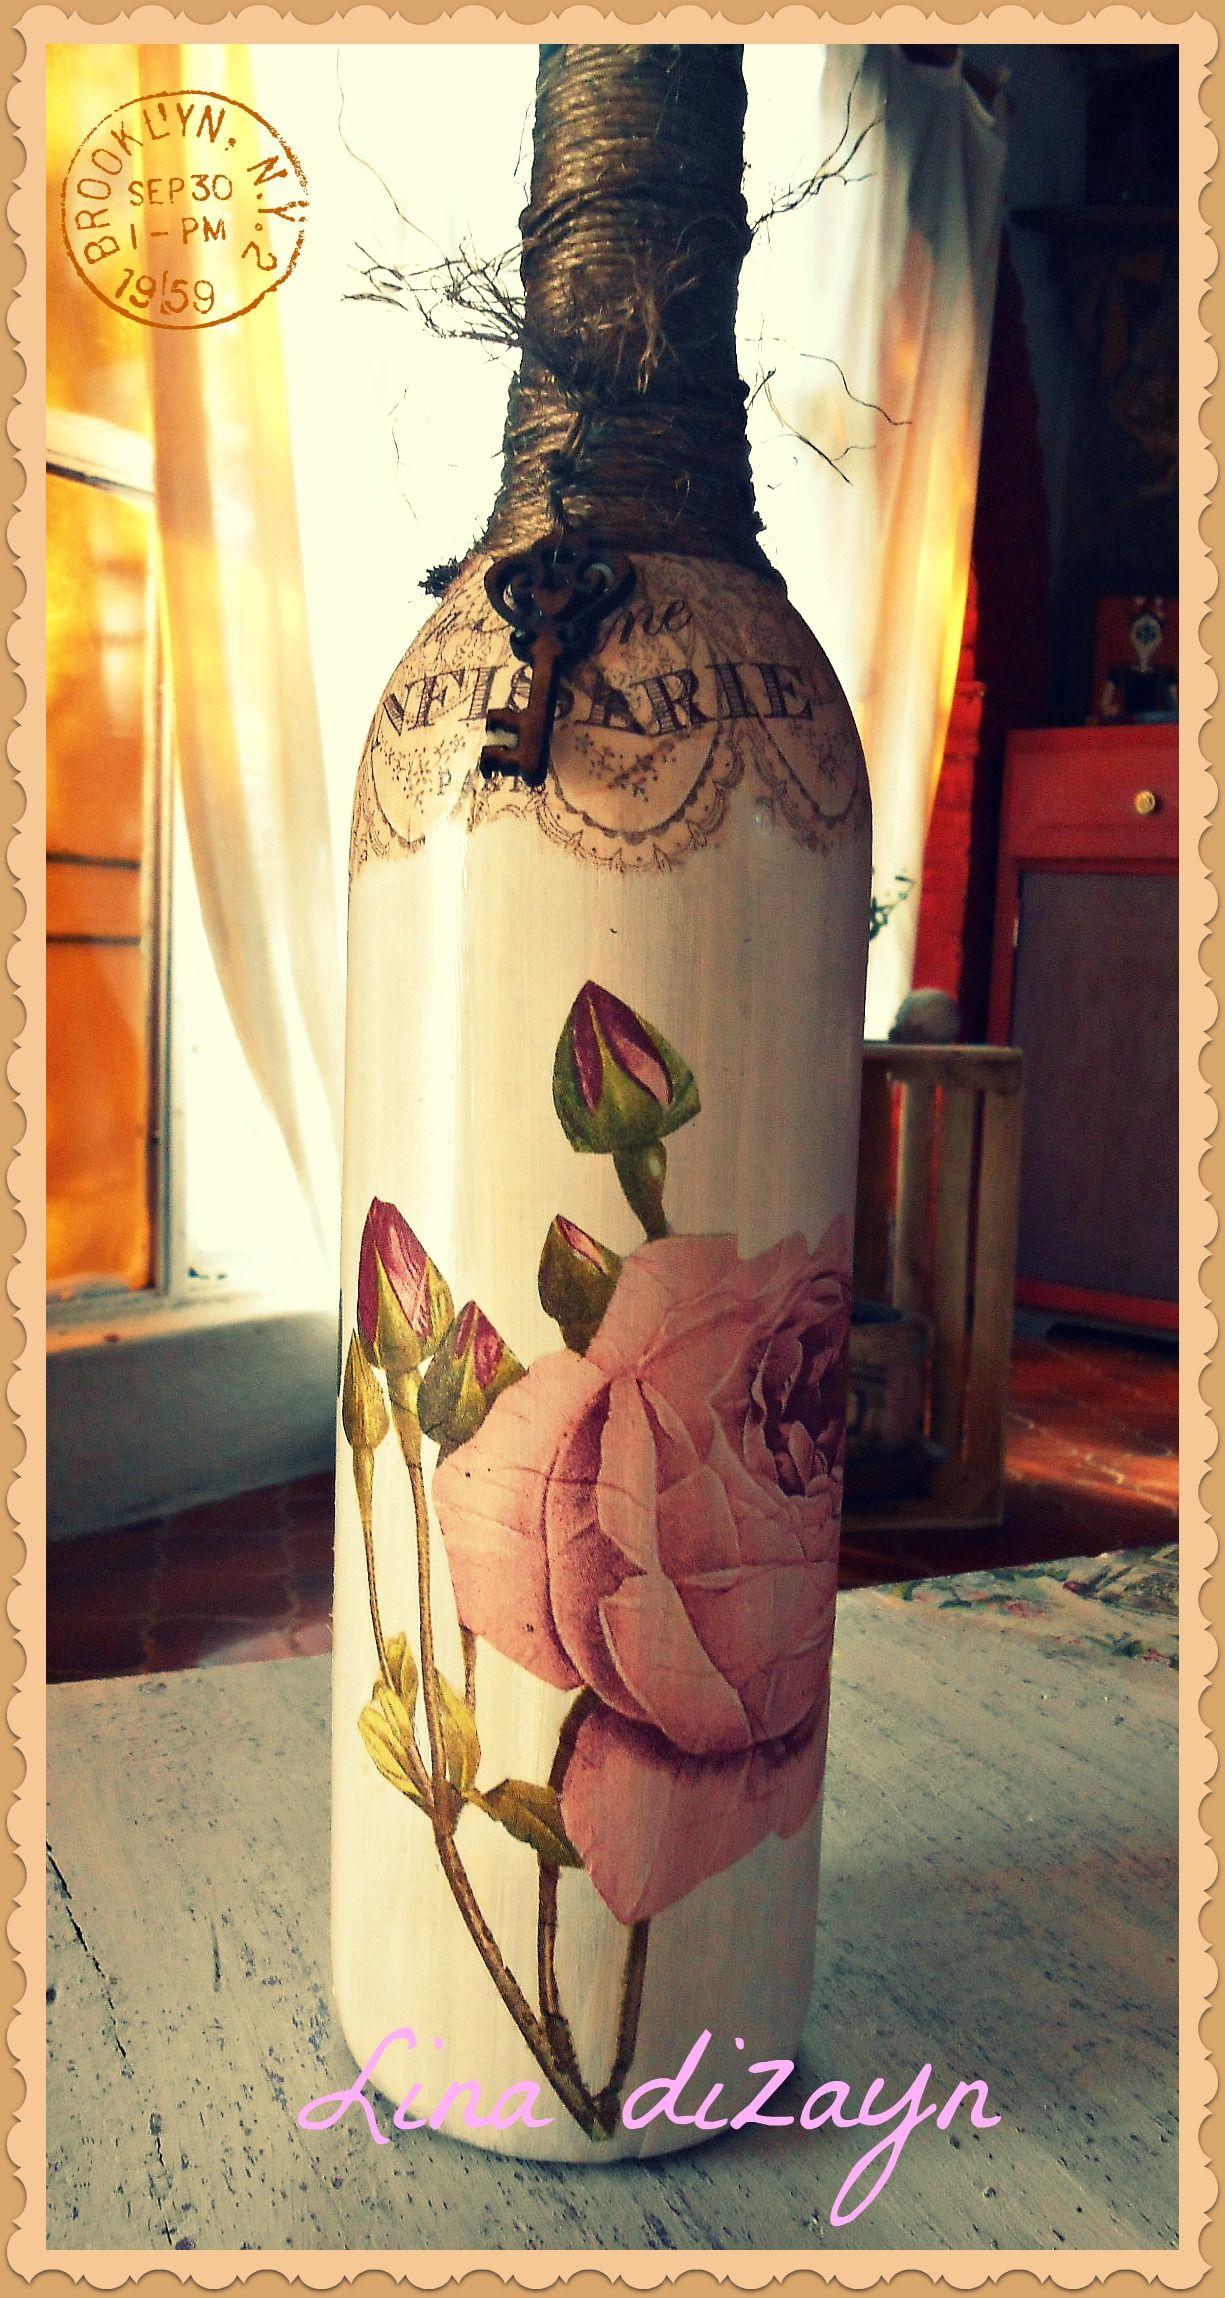 Botella de vidrio técnica decoupage motivo rosa con llave vintage, por: Lina dizayn